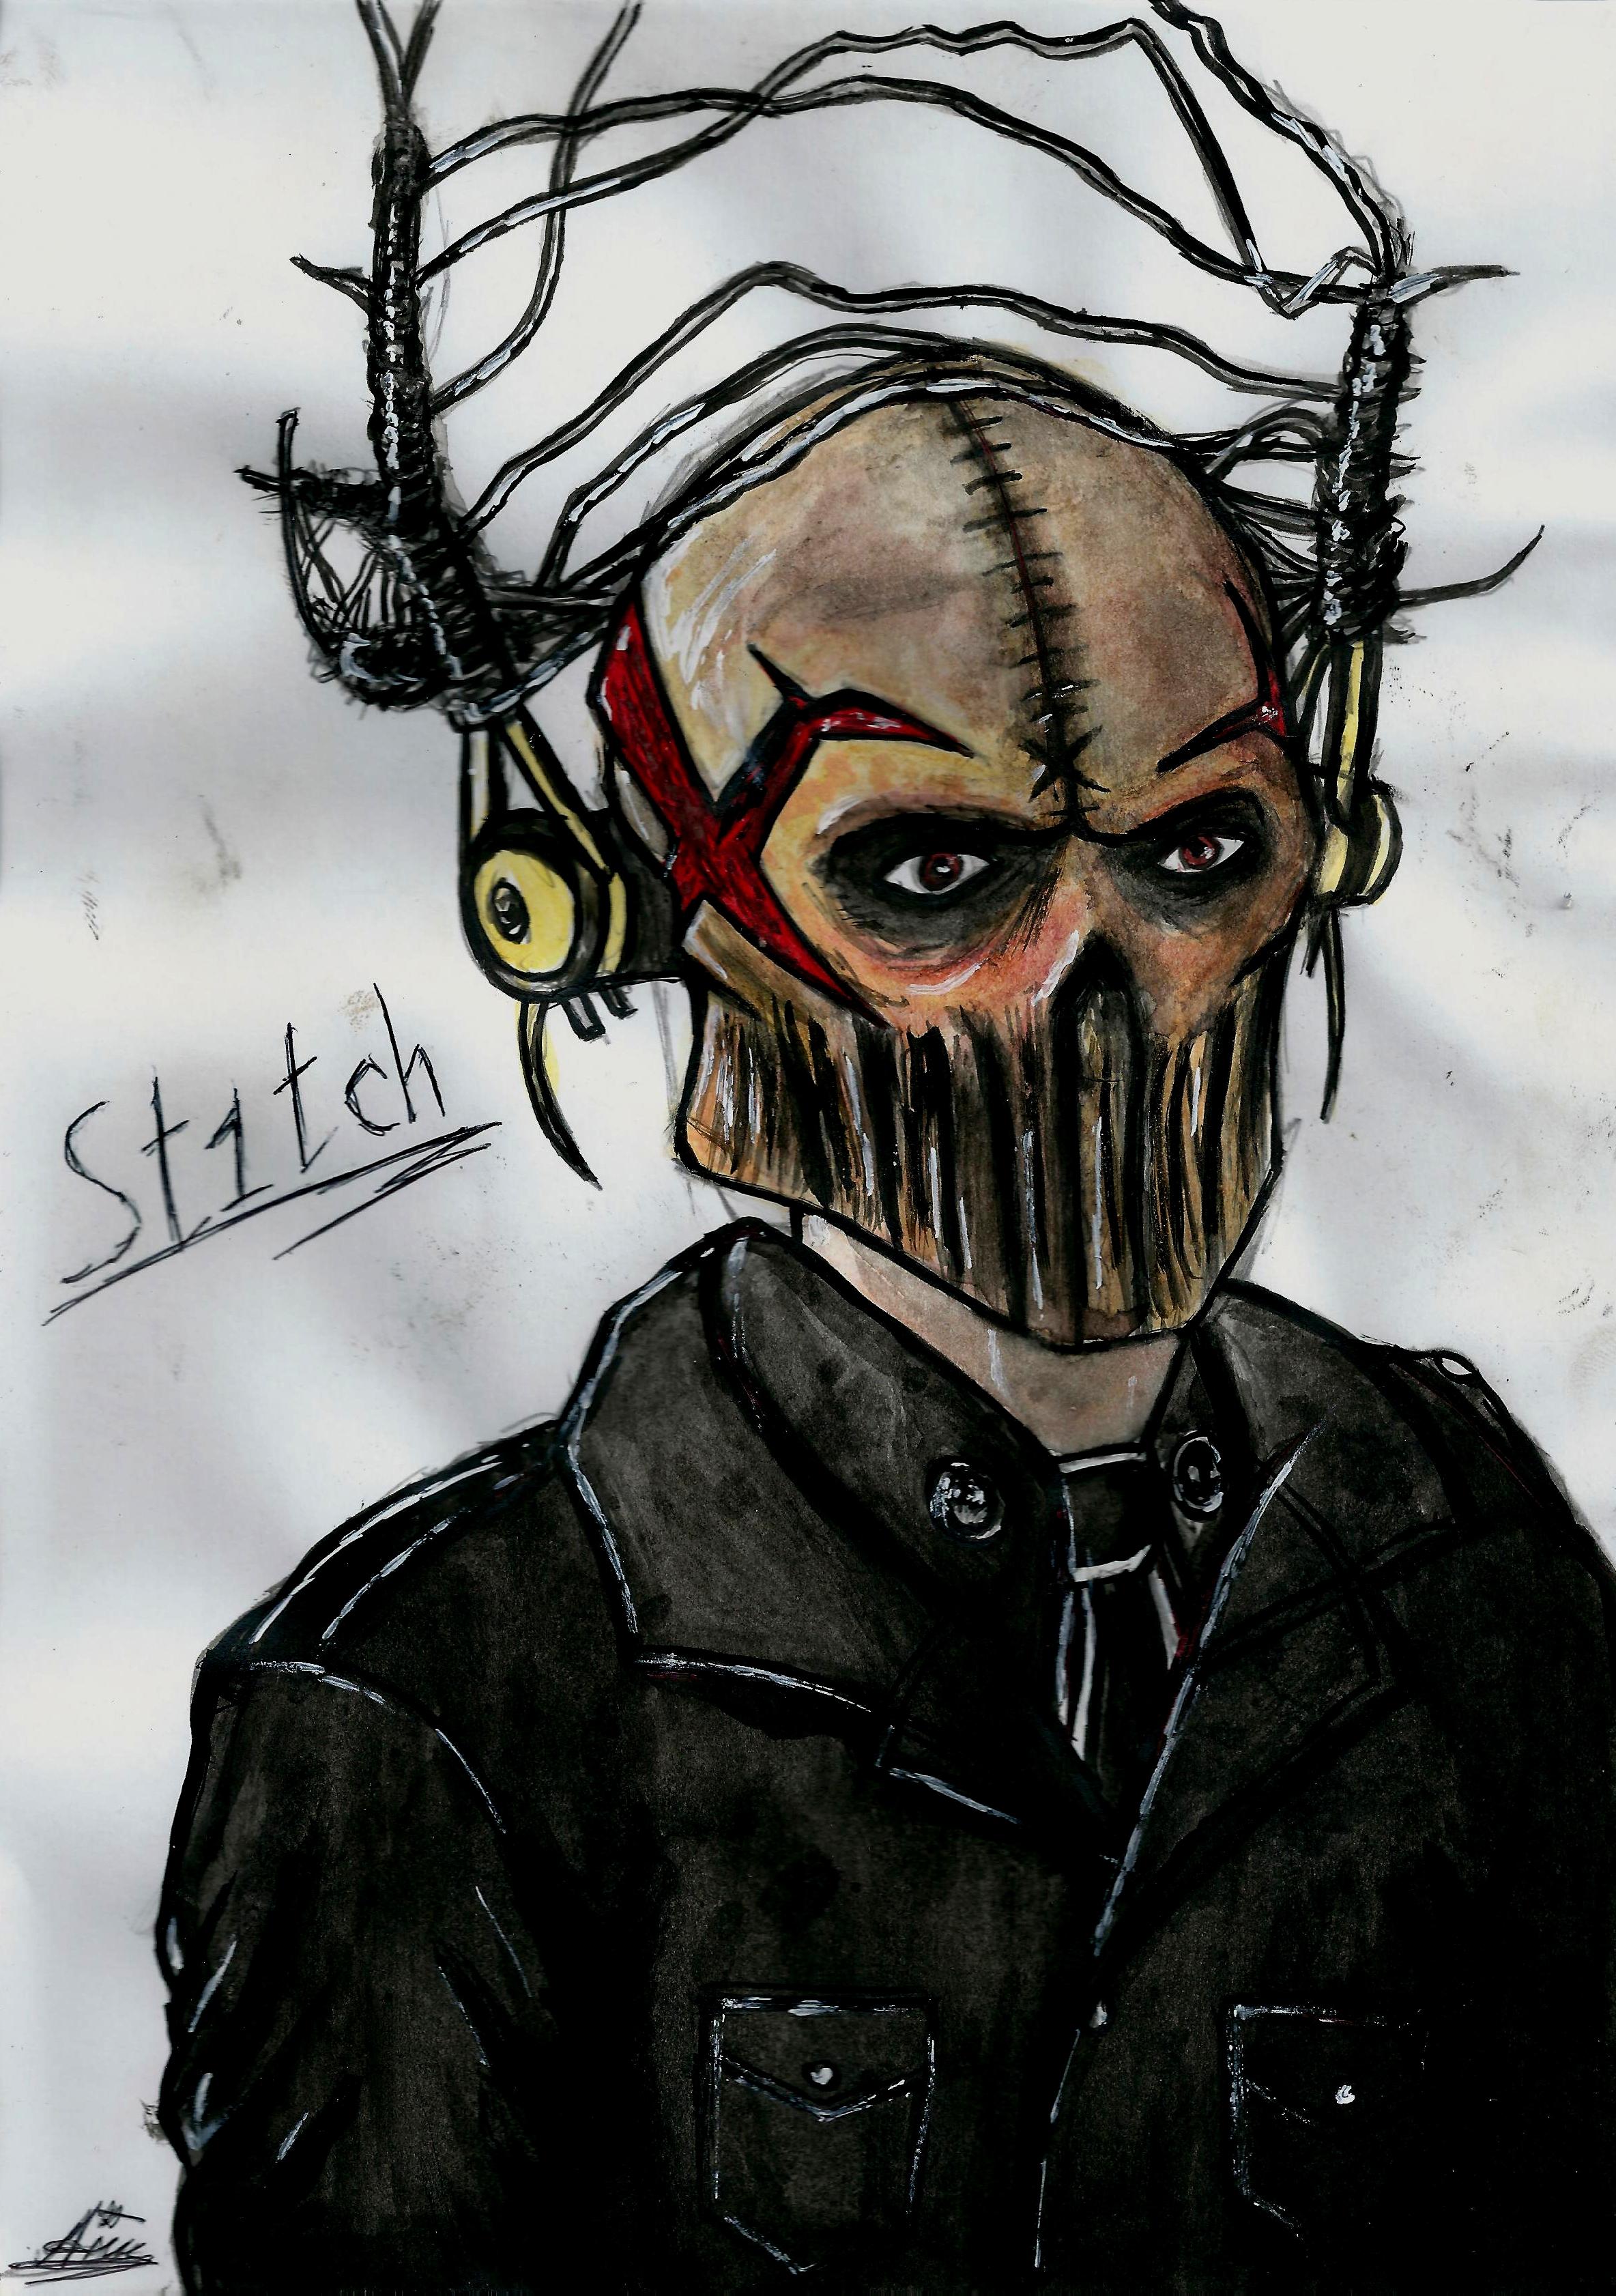 St1tch by NiGHTSgirl666